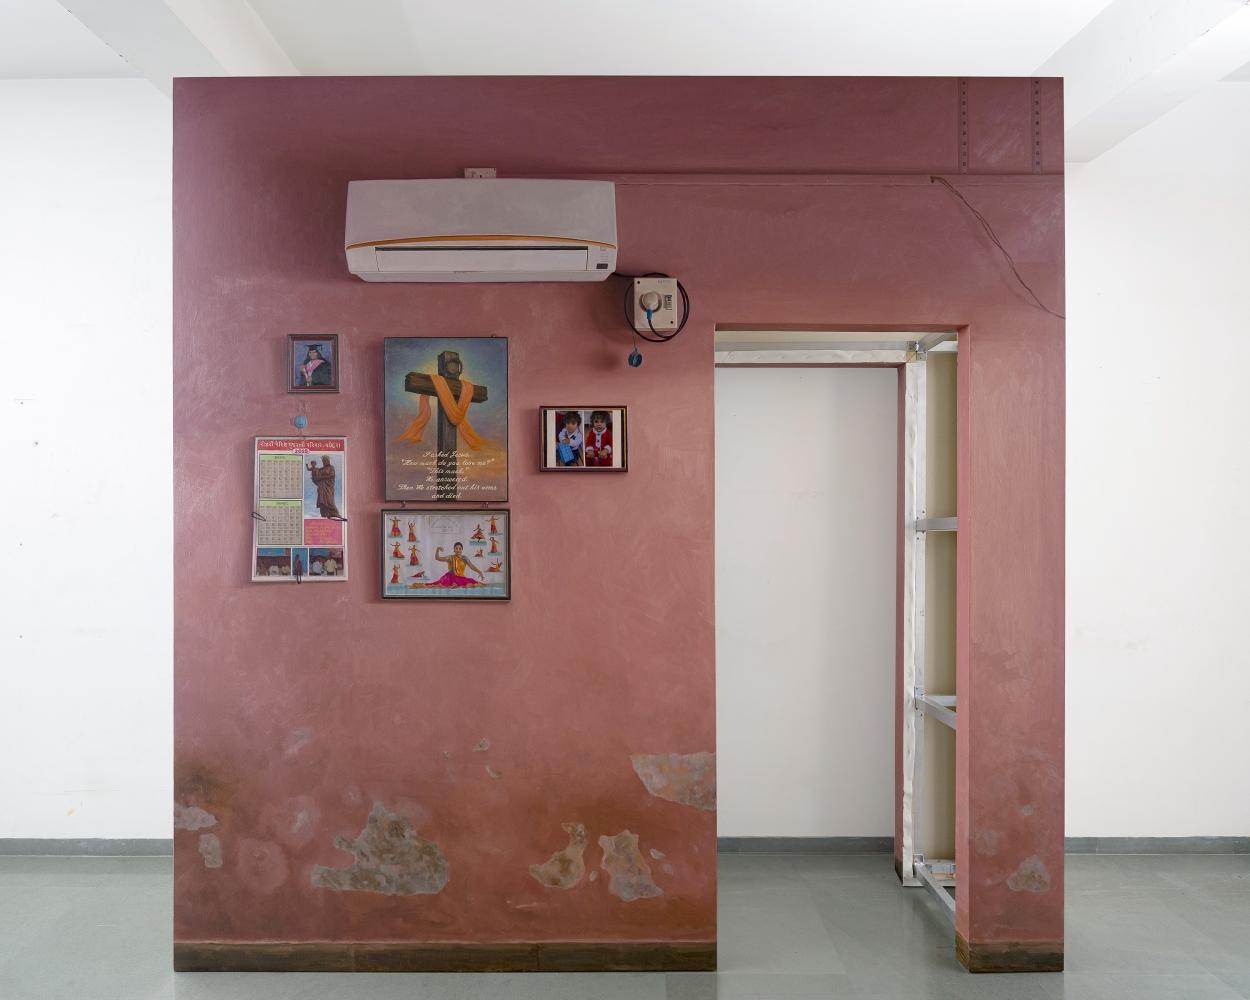 ABIR KARMAKAR Passage 5, 2020  Oil on canvas  108 x 112 in / 274.3 x 284.5 cm  (Part 1 of Set 3)